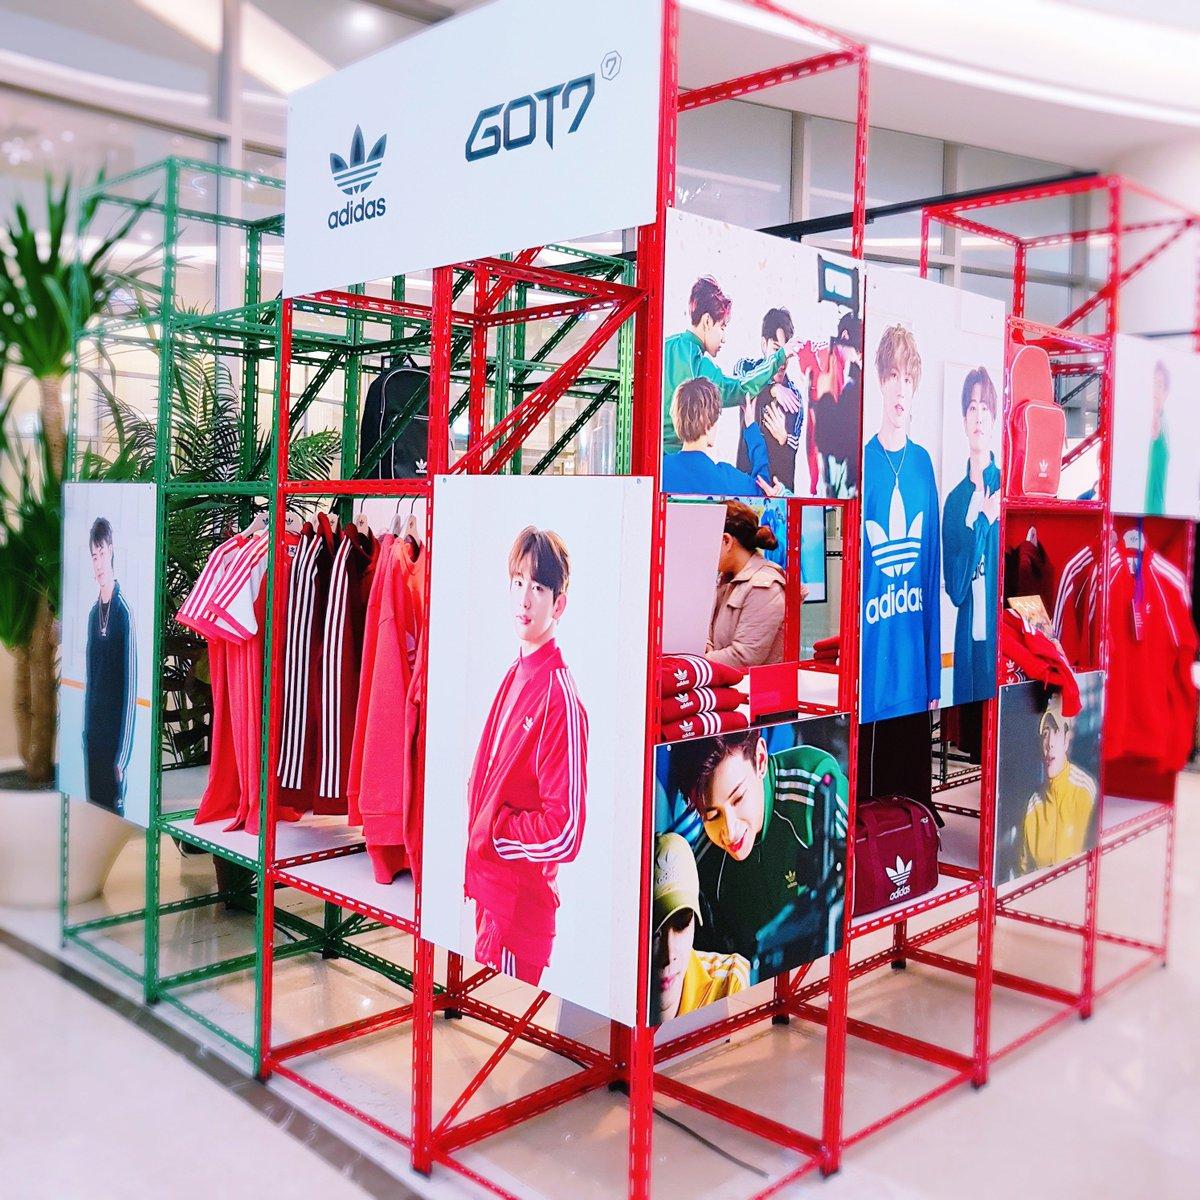 GOT7 X adidas Pop-up Store @ TIMESQUARE 2018.03.15 - 2018.03.18  #GOT7 #갓세븐 #EyesOnYou #Look #adidas #아디다스